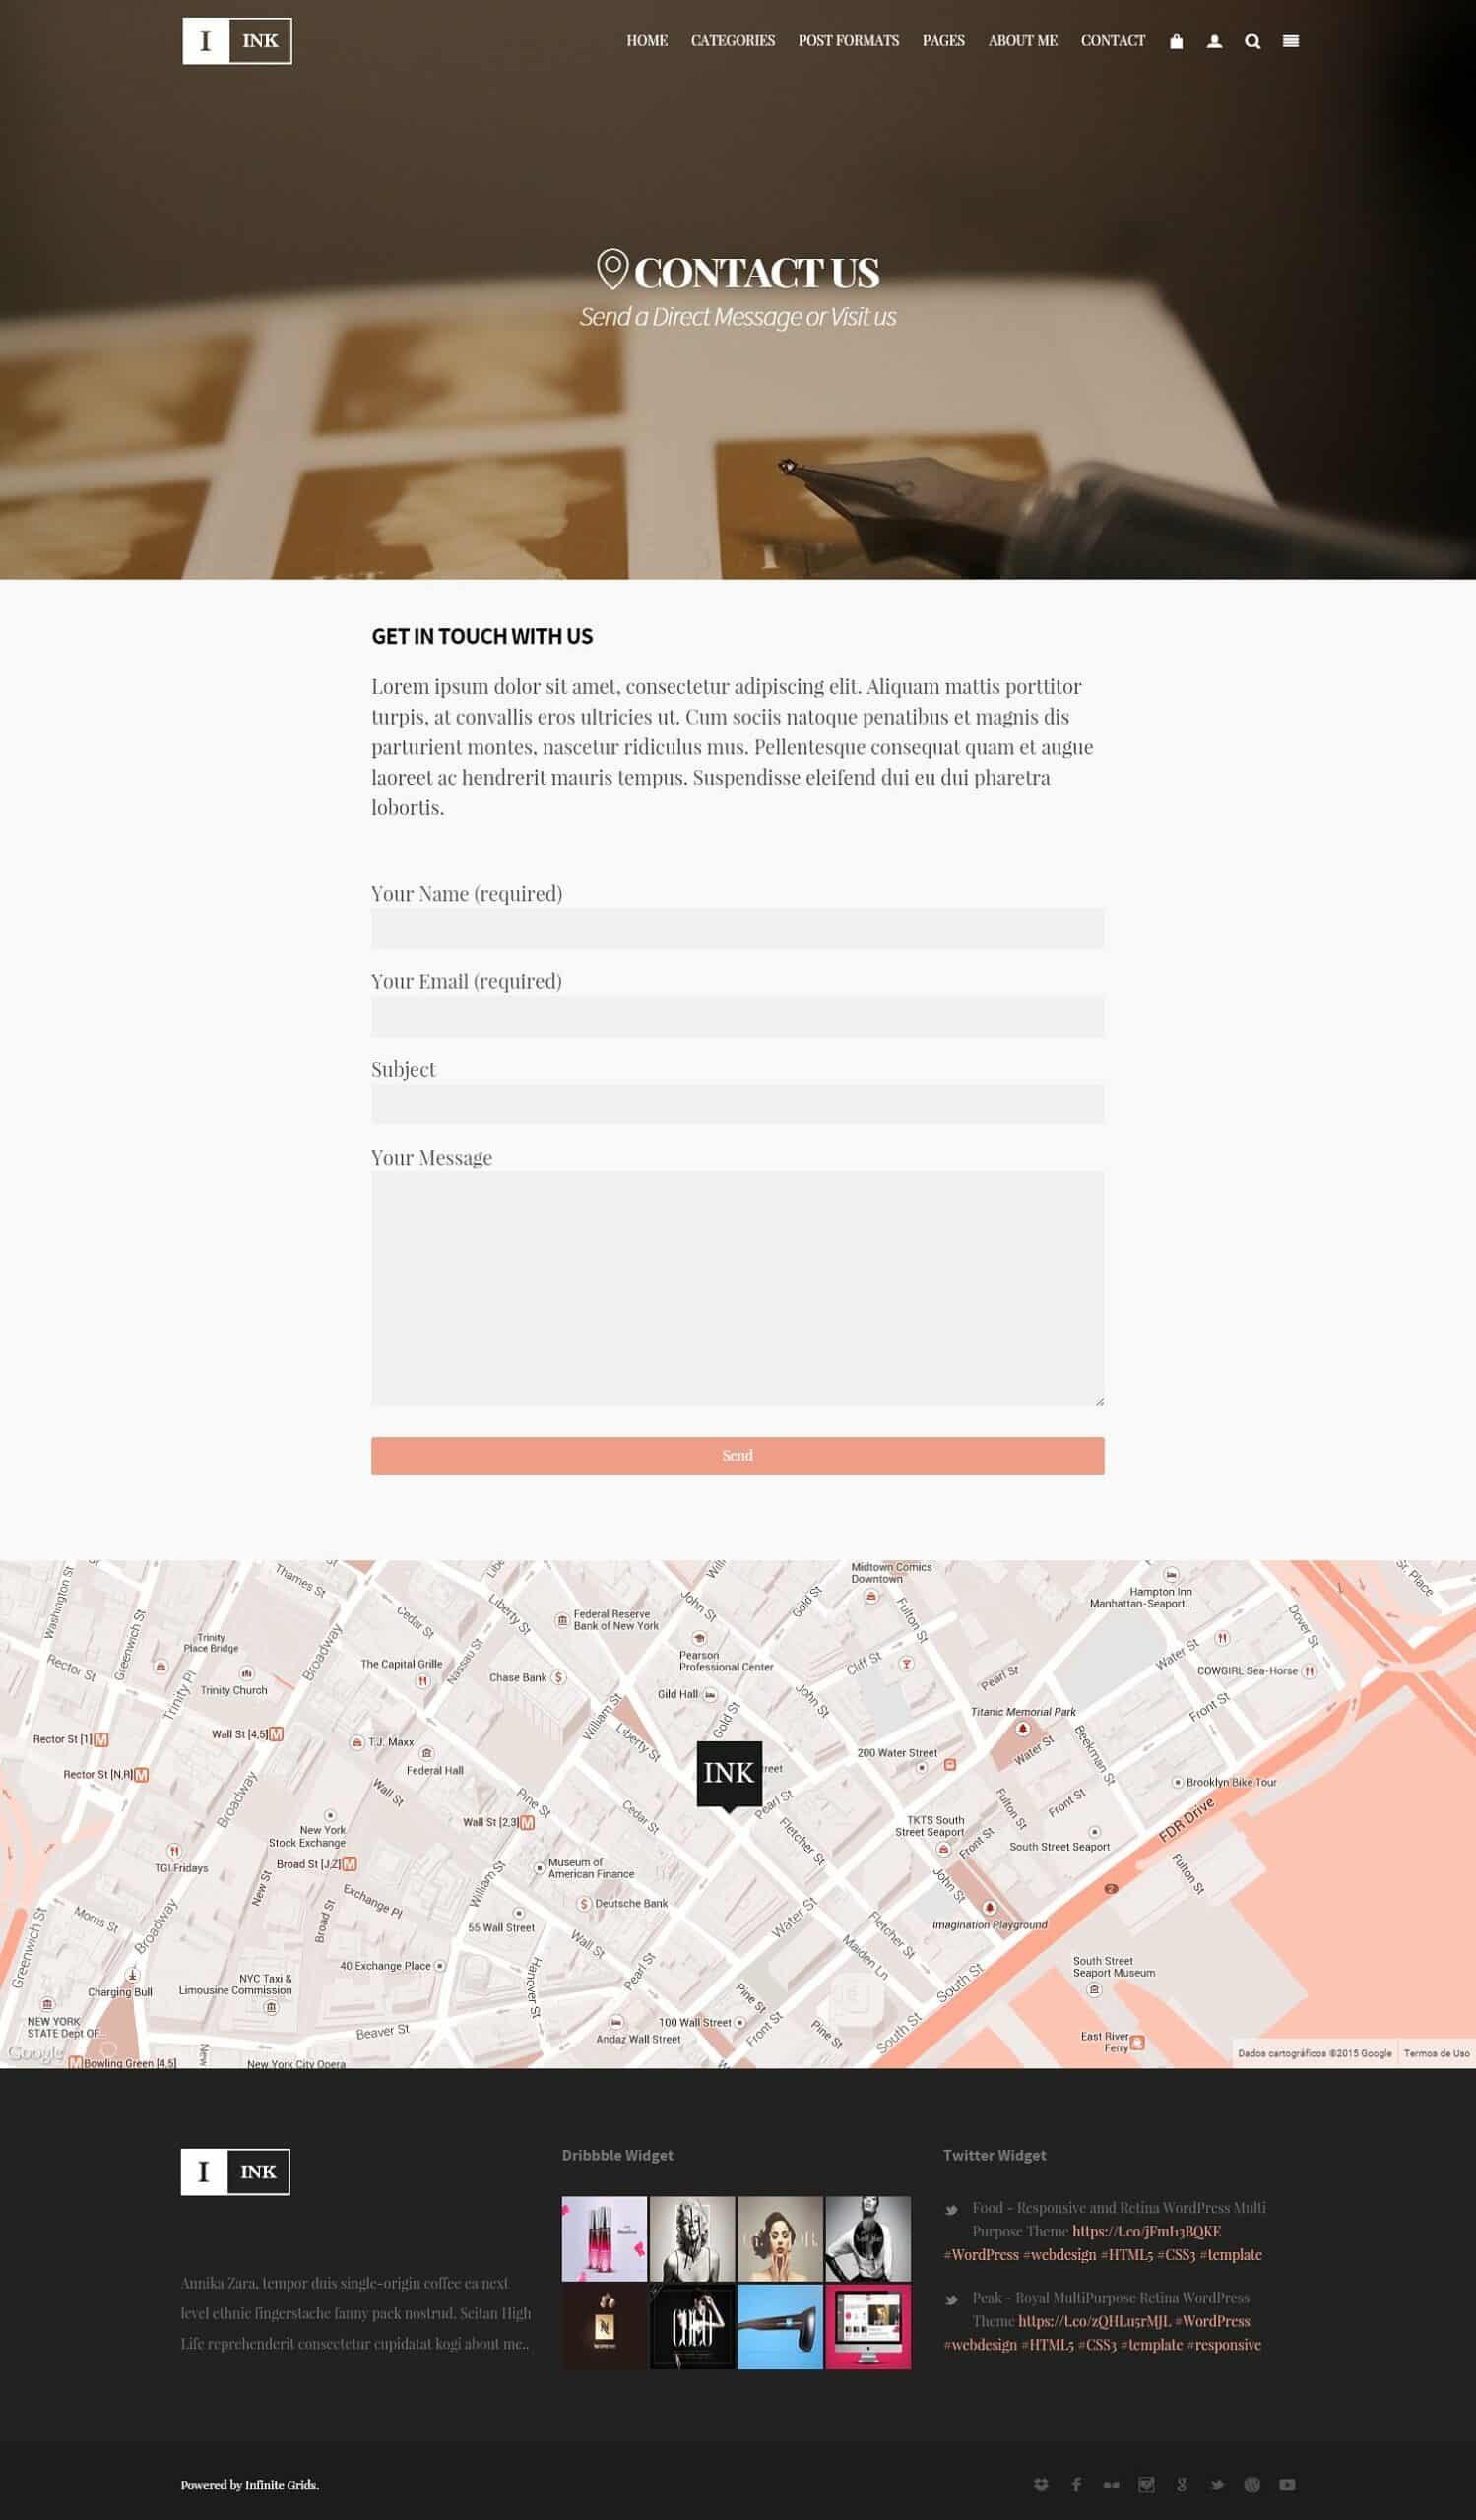 Ink WordPress Theme Blog Screenshots from demonstrative page